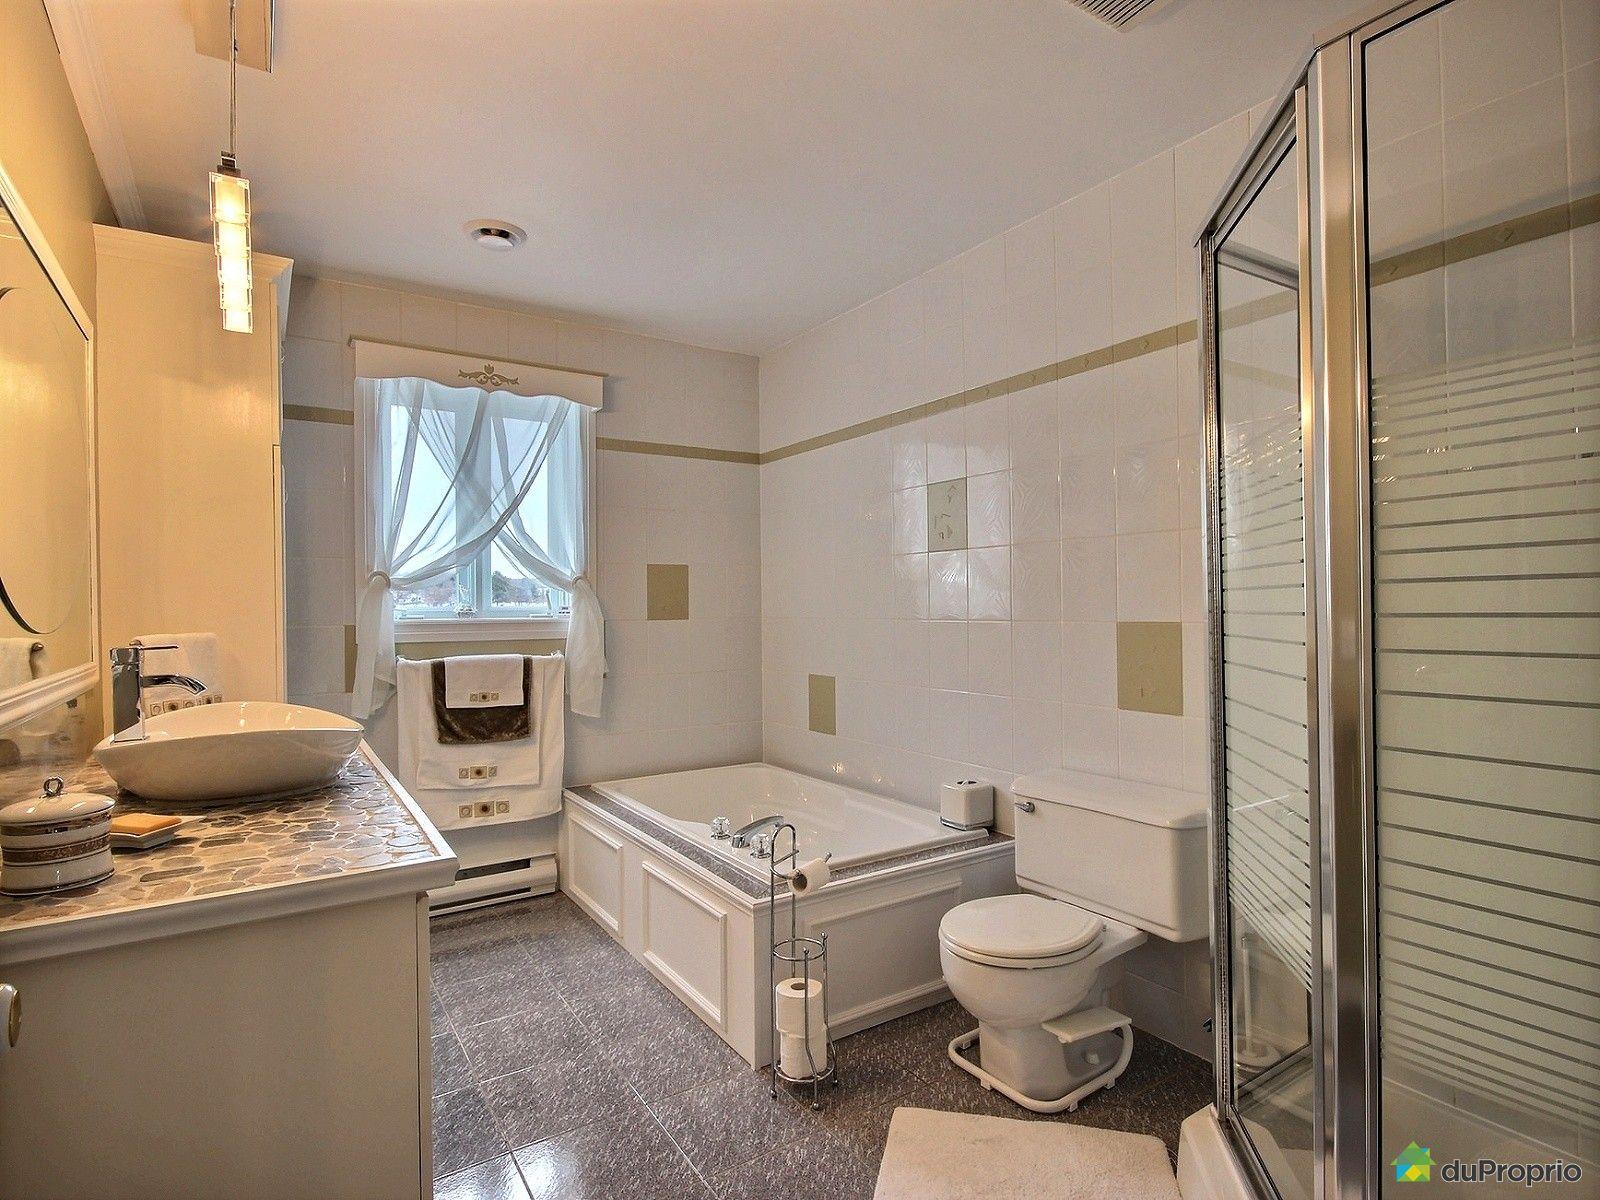 maison vendre sorel tracy 120 rue de l 39 oasis immobilier qu bec duproprio 634919. Black Bedroom Furniture Sets. Home Design Ideas